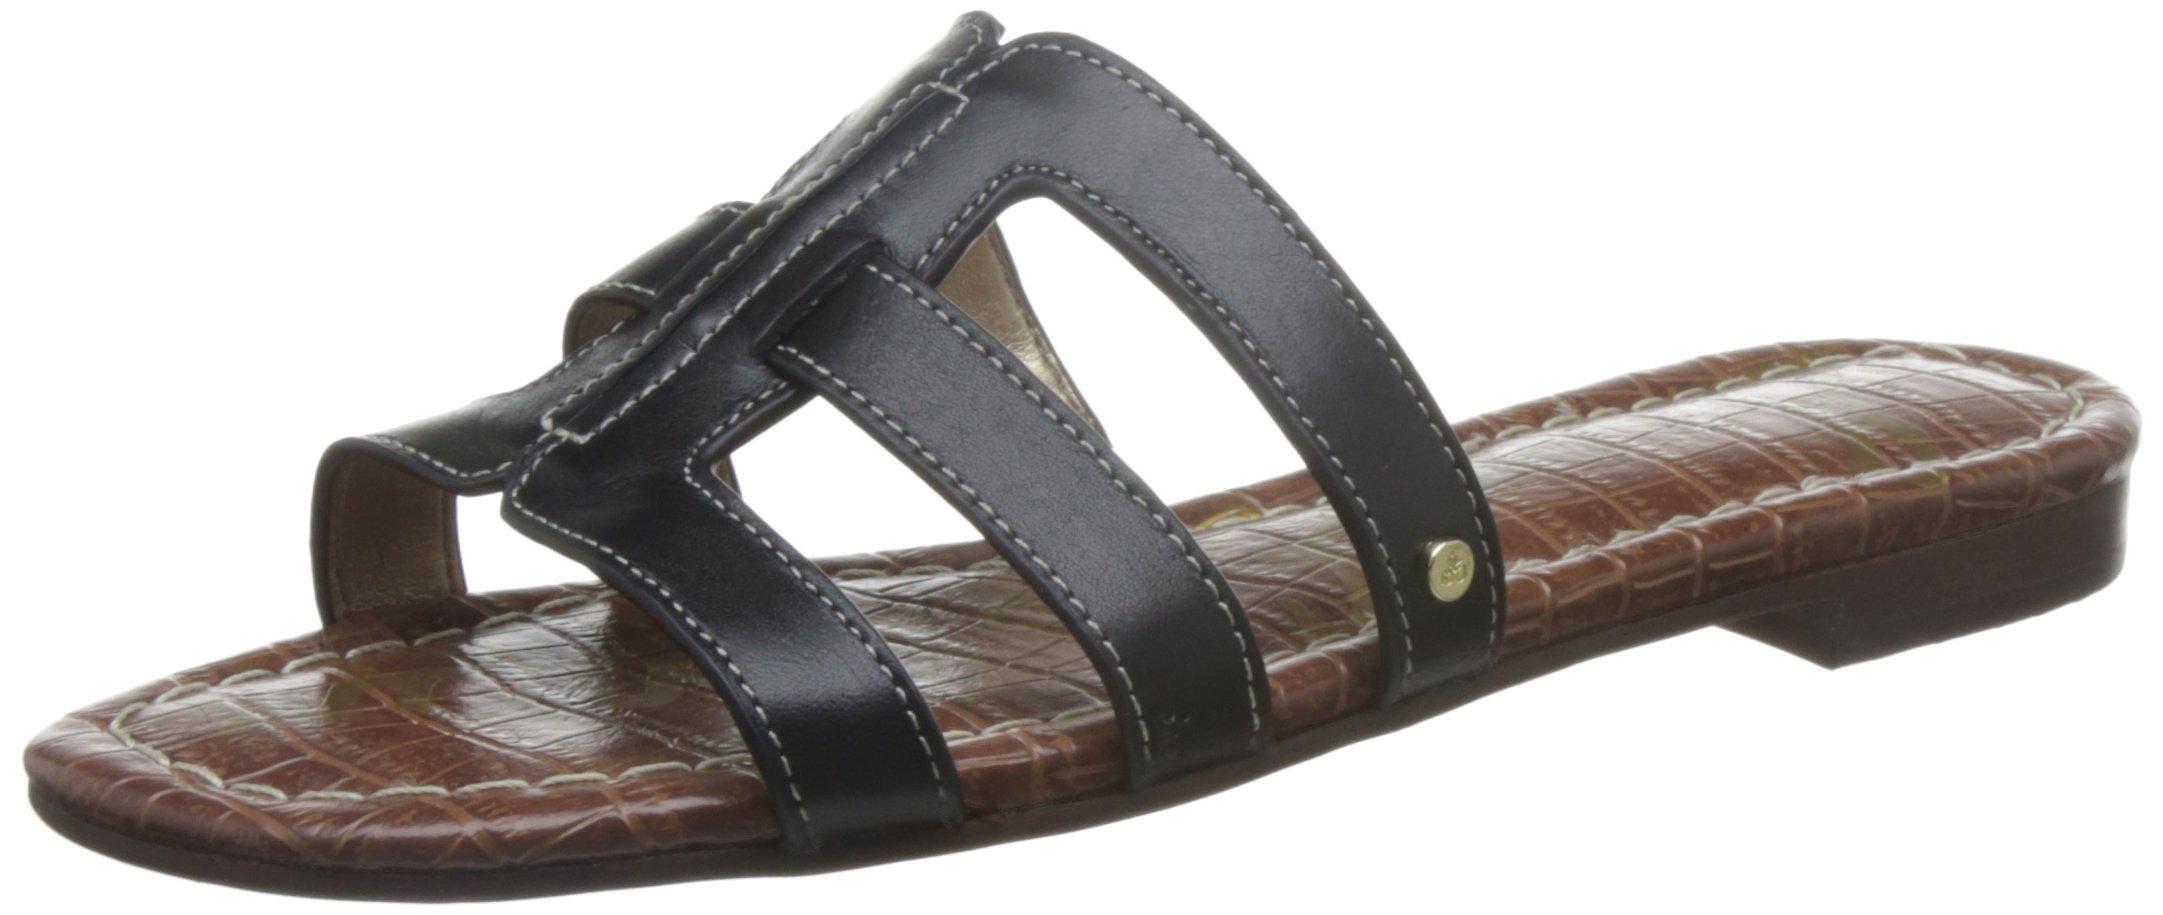 Sam Edelman Women's Berit, Black Leather, 8.5 M US